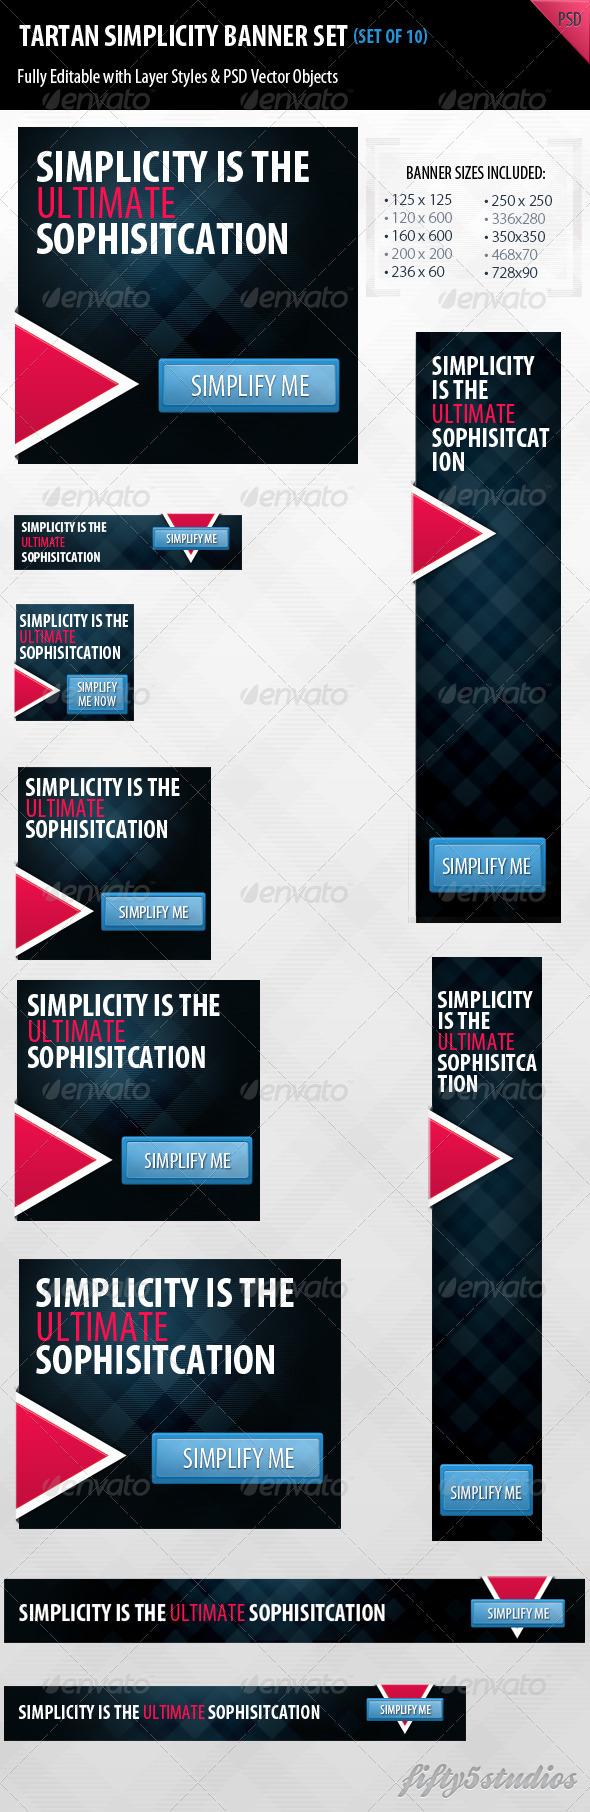 GraphicRiver Tartan Simplicity Banner Set 531160